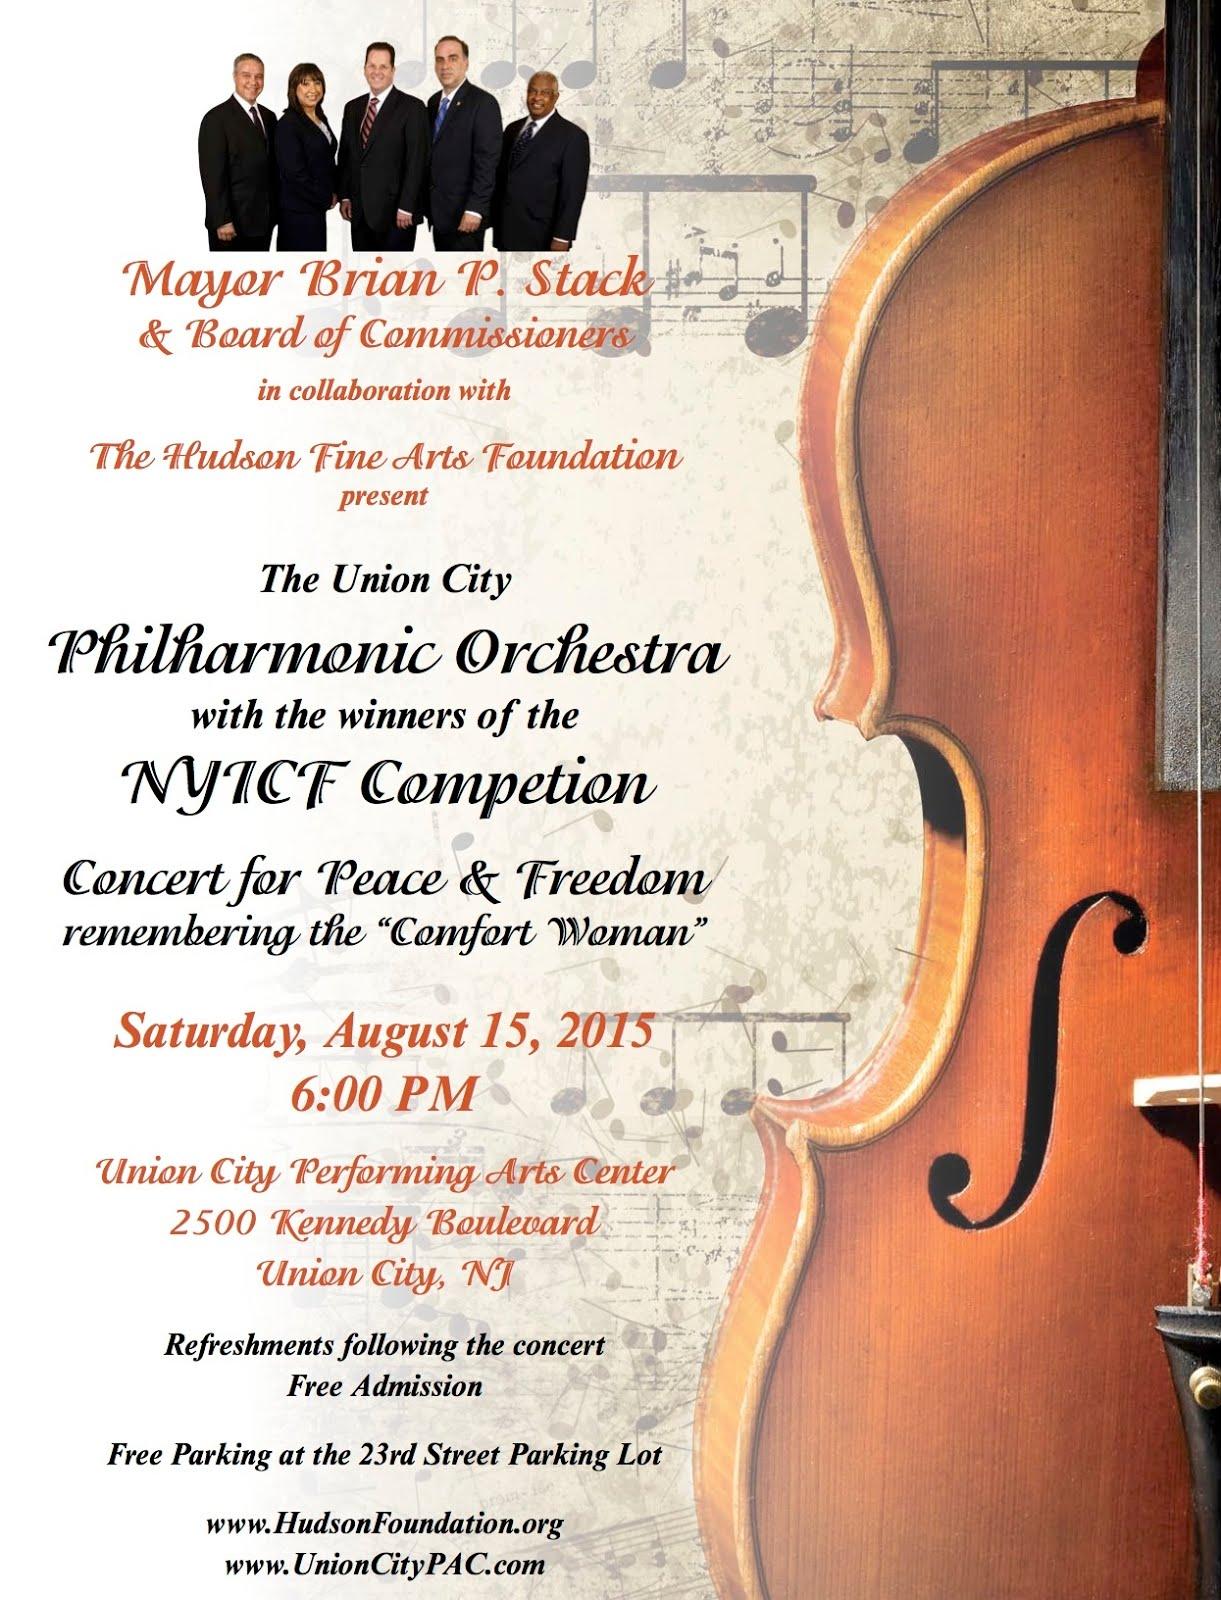 UC Philharmonic Orchestra